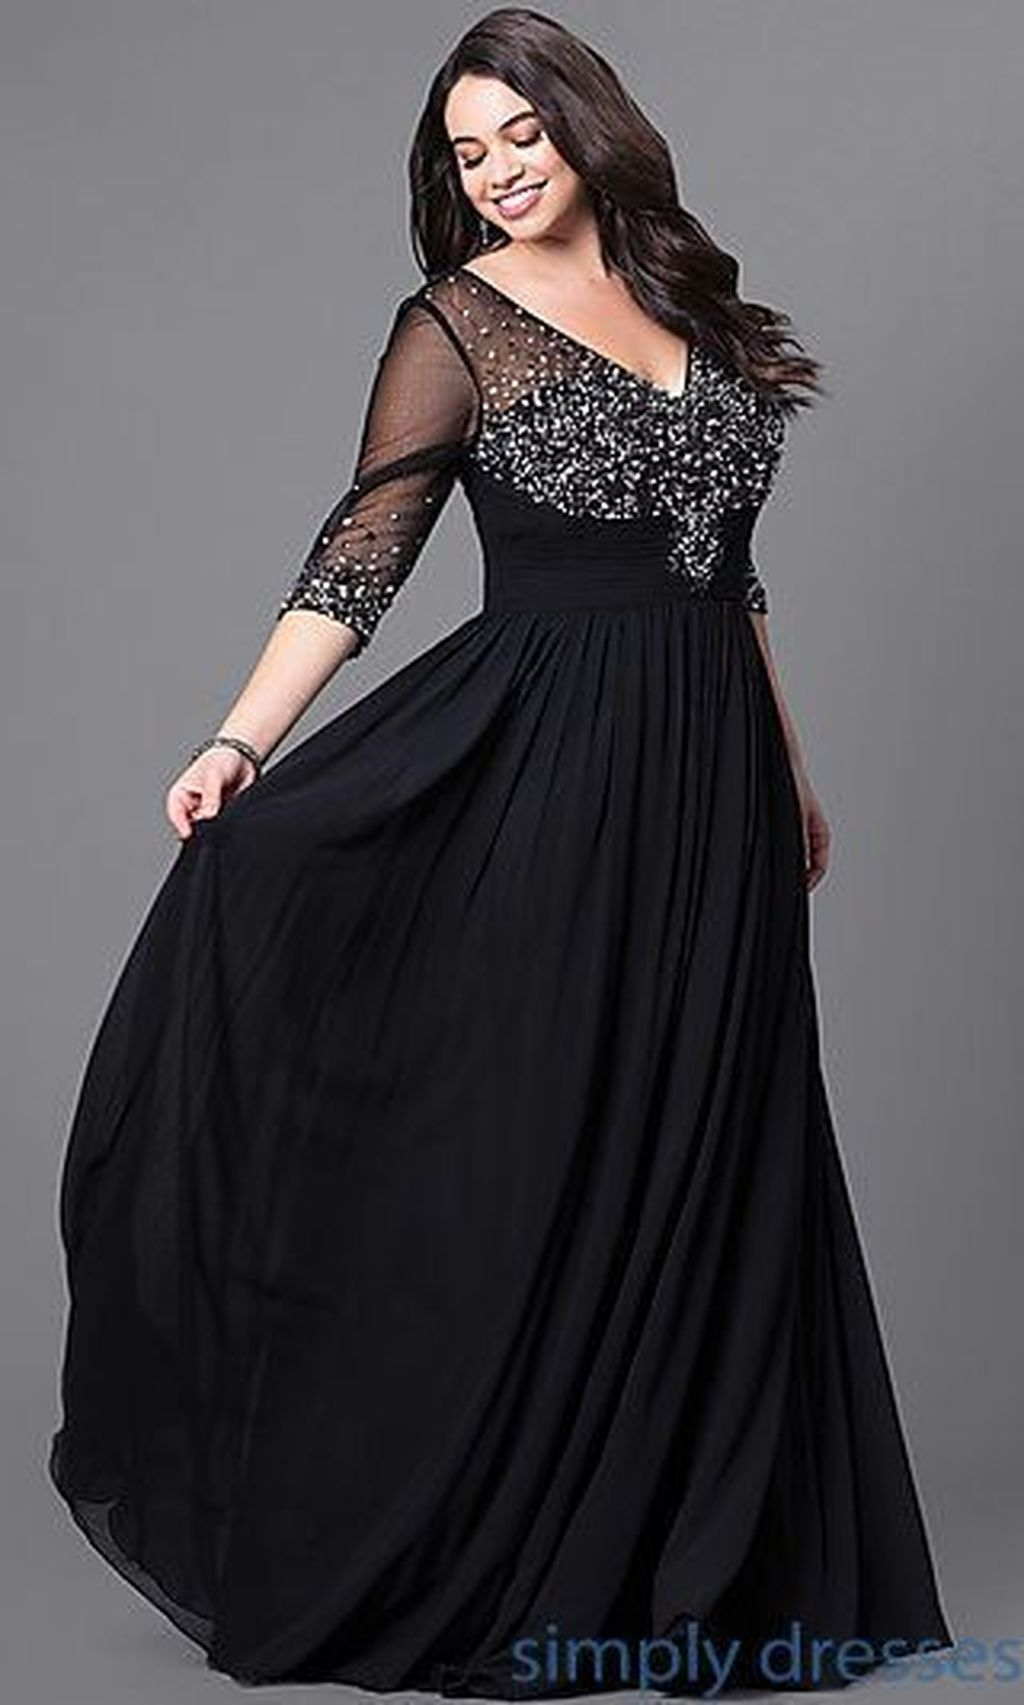 stunning plus size evening gown ideas rokke skoene pinterest